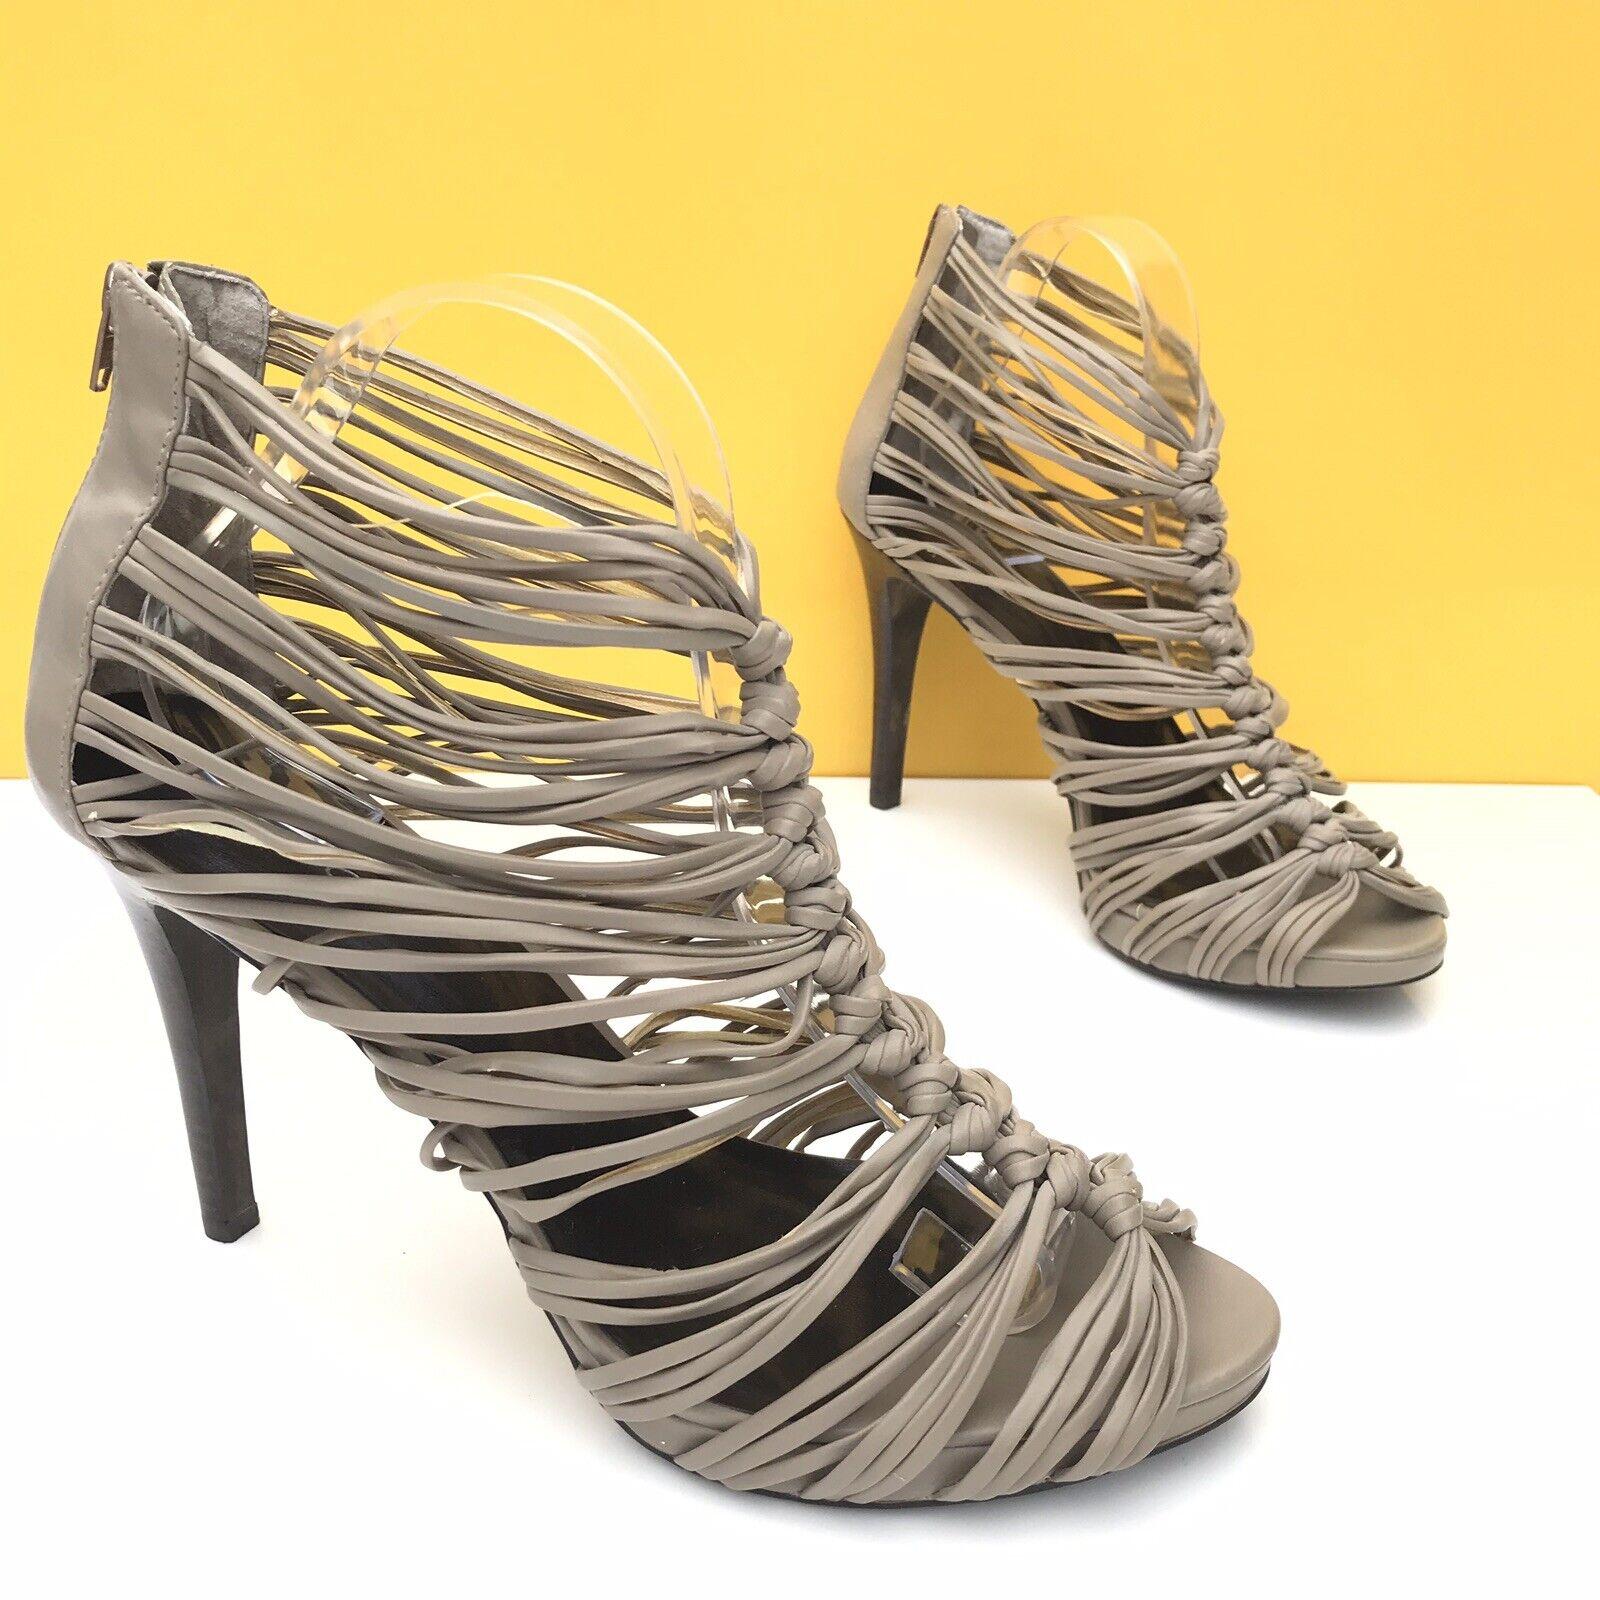 Aldo High Heel NEW Stiletto Sandals UK9 EUR42 Olive Grey Women's Shoes Peep Toe